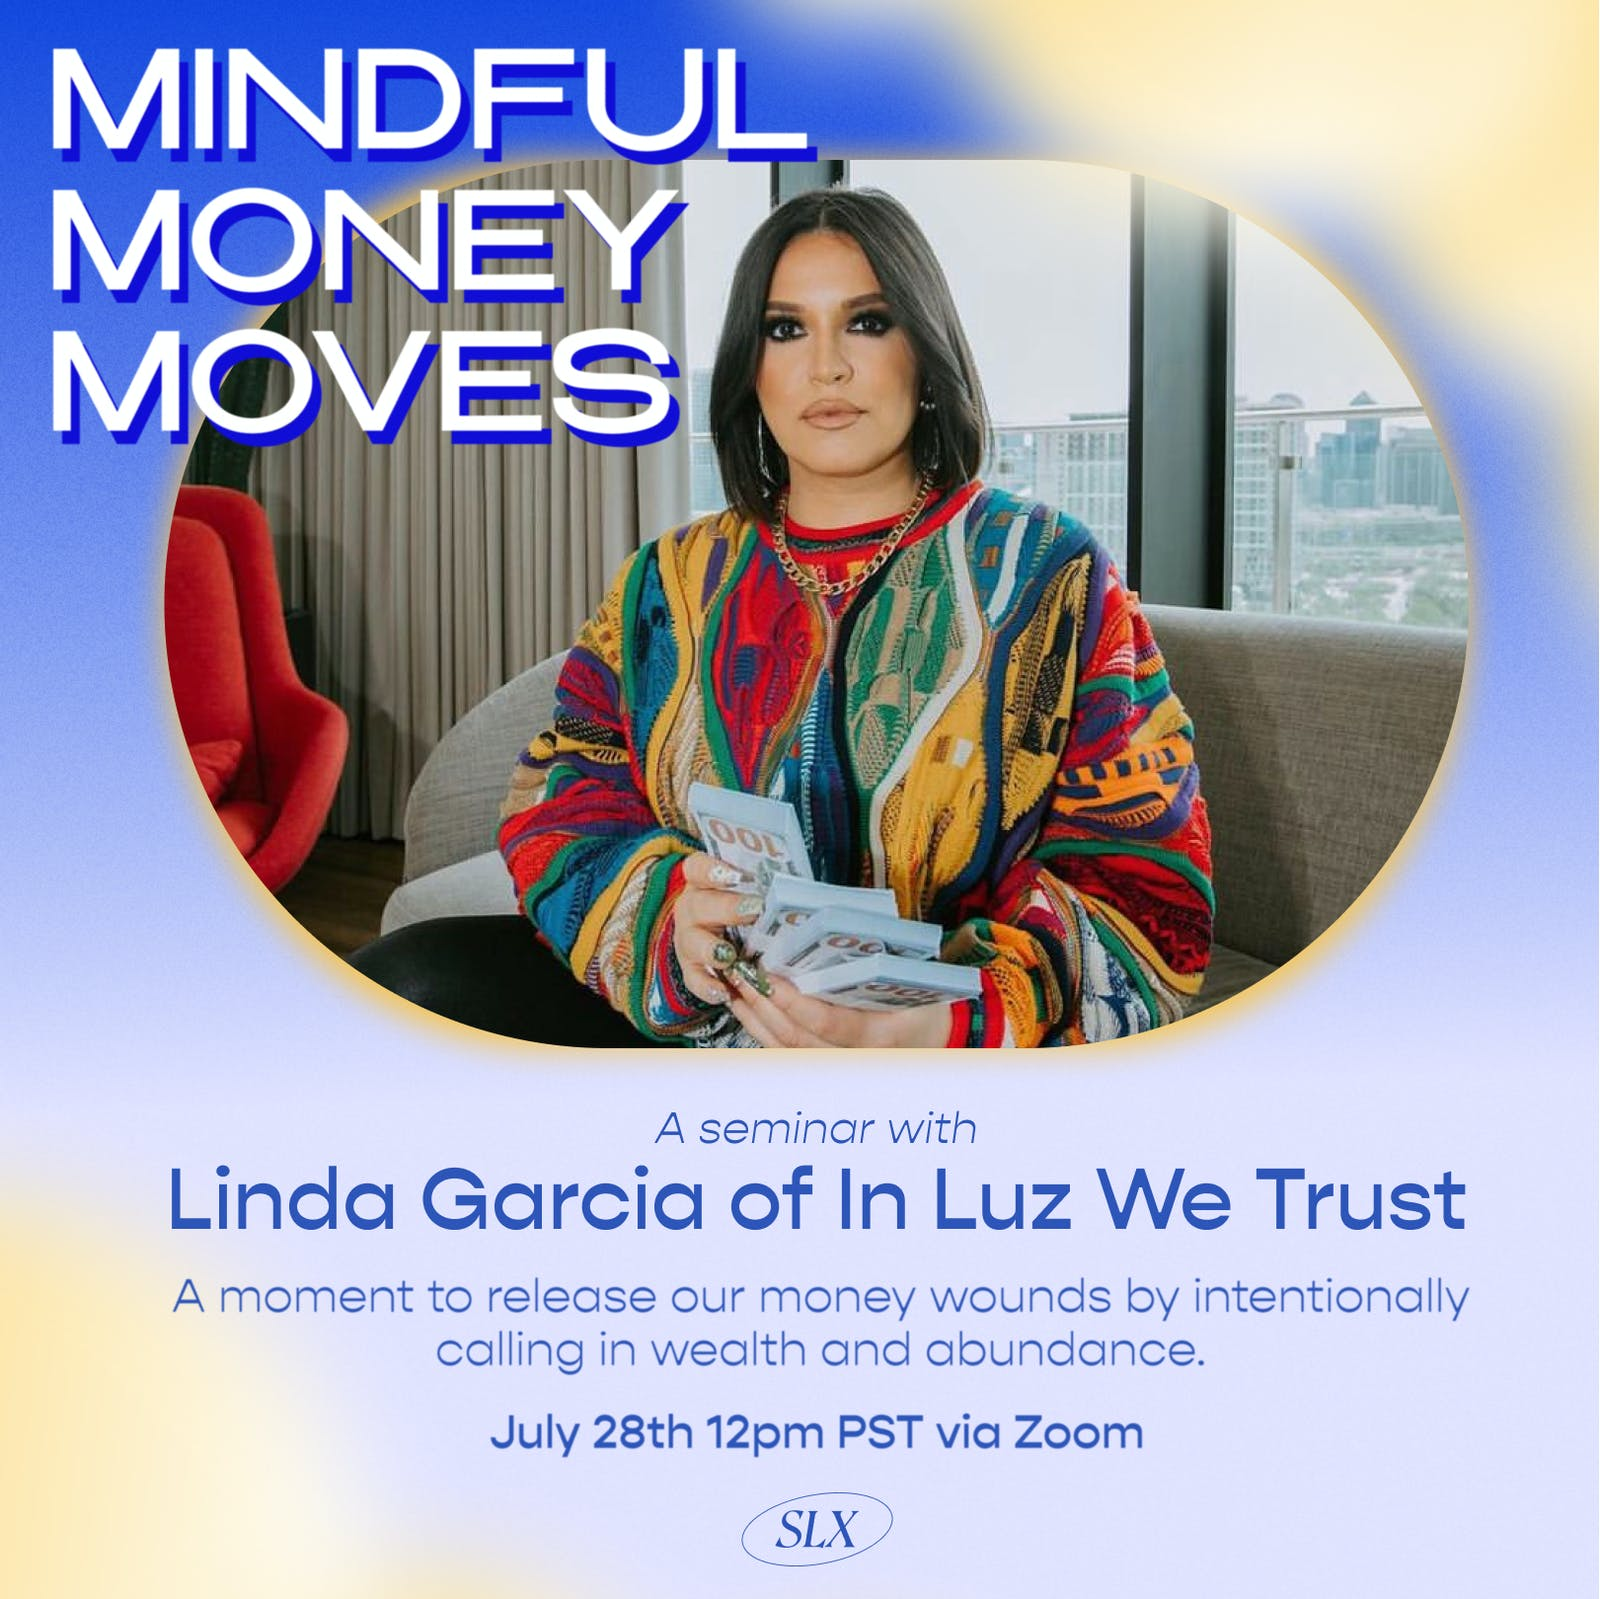 Mindful Money Moves